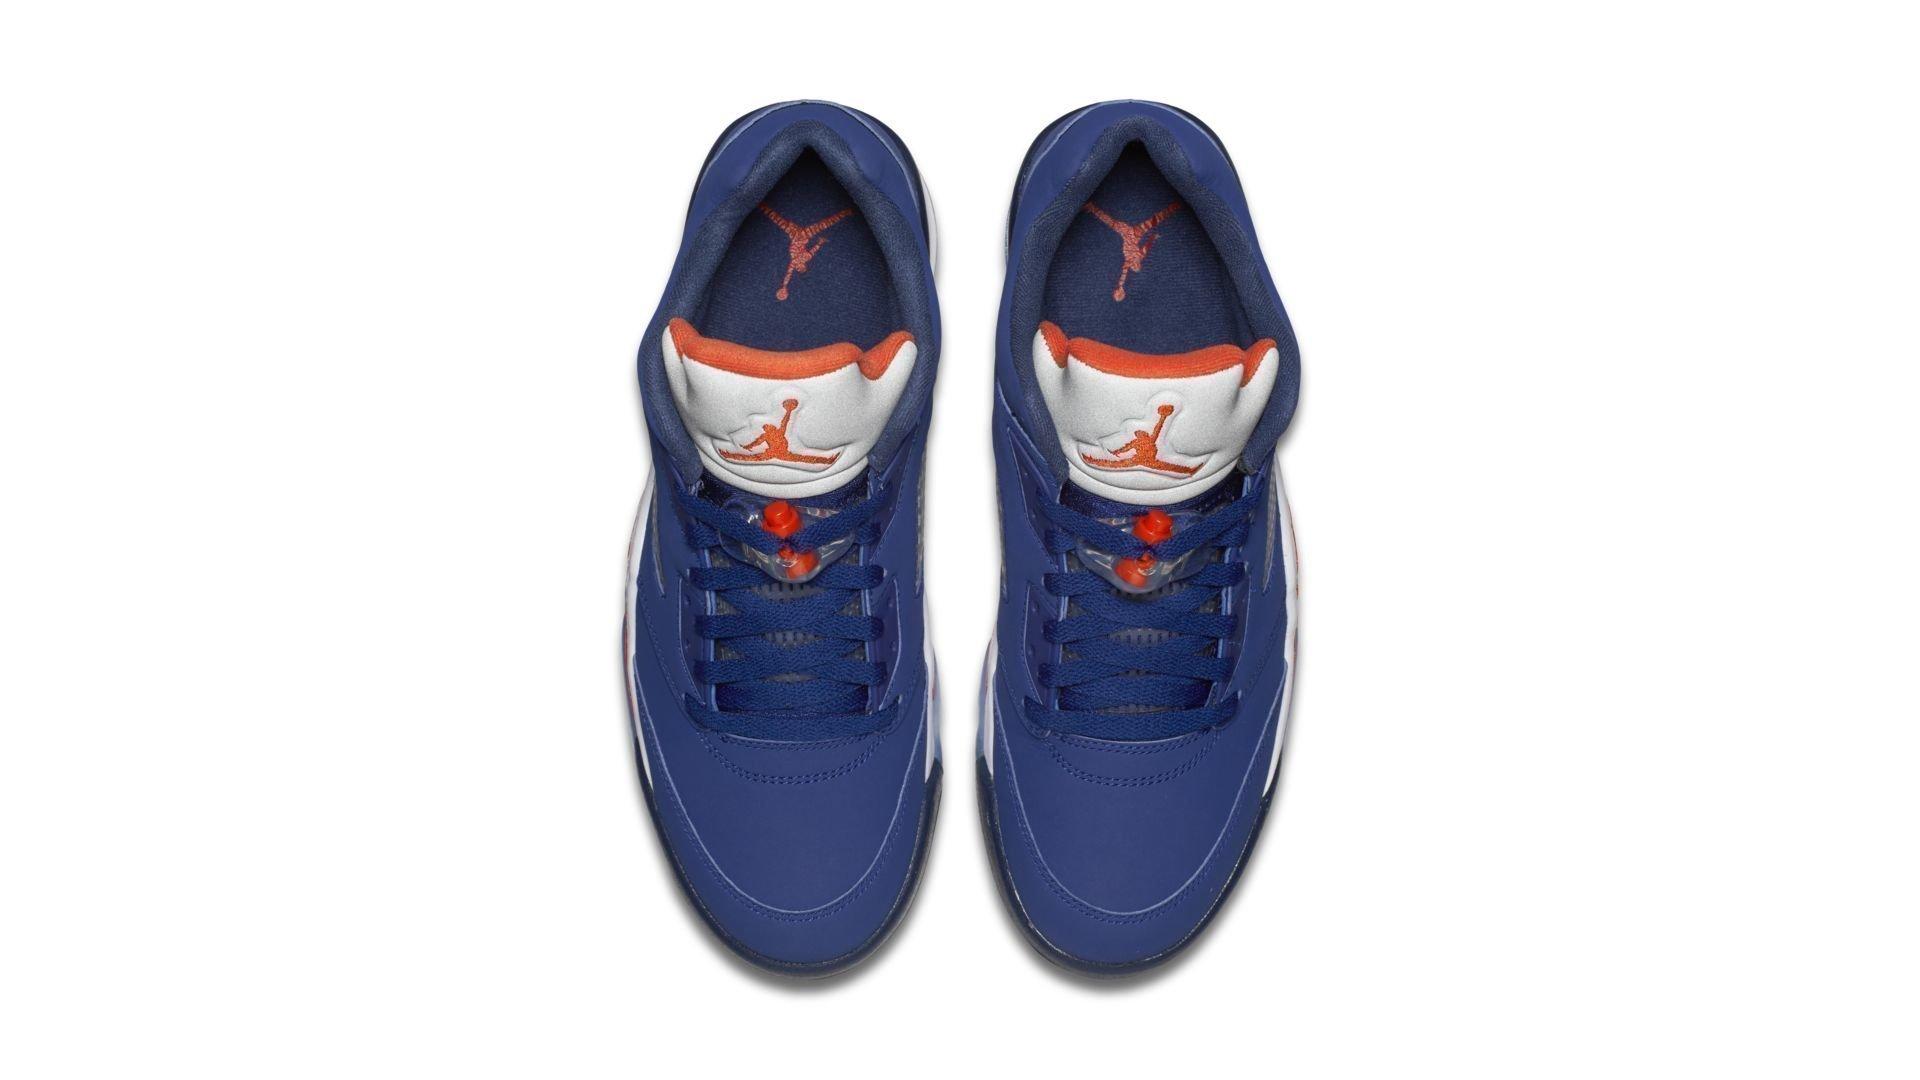 Jordan 5 Retro Low Knicks (819171-417)